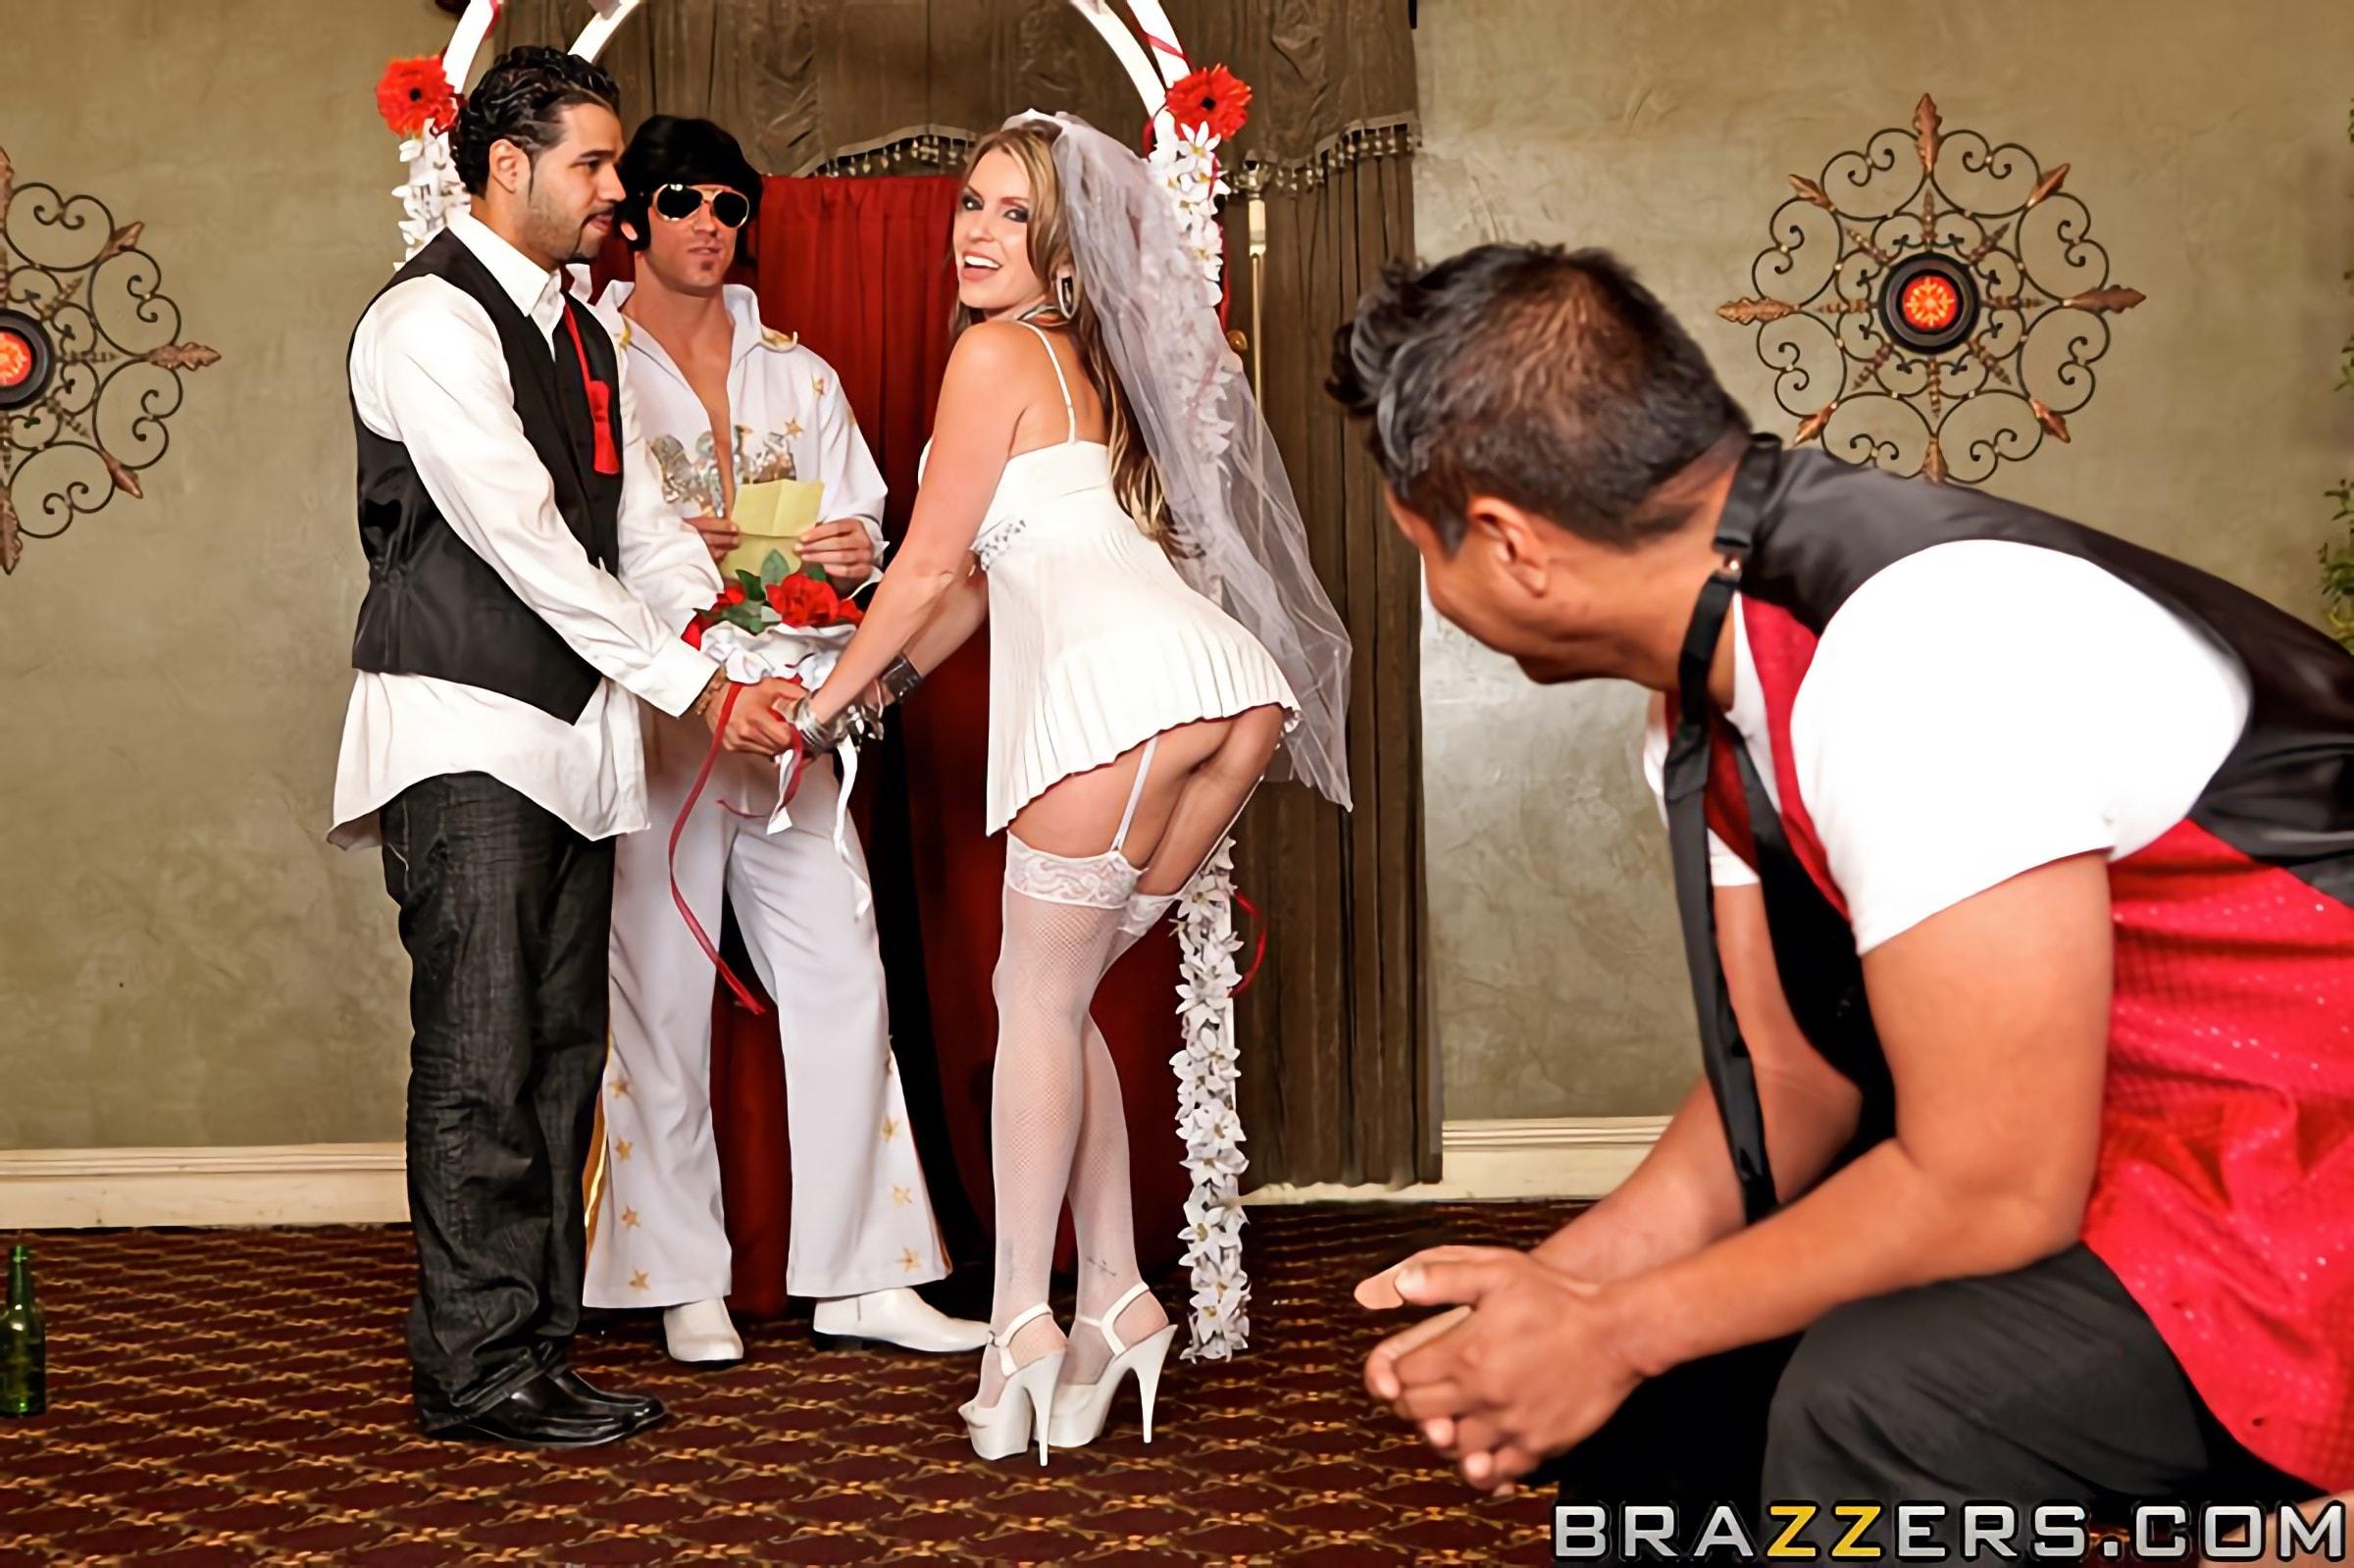 Brazzers 'Fuck Me Tender' starring Courtney Cummz (Photo 5)